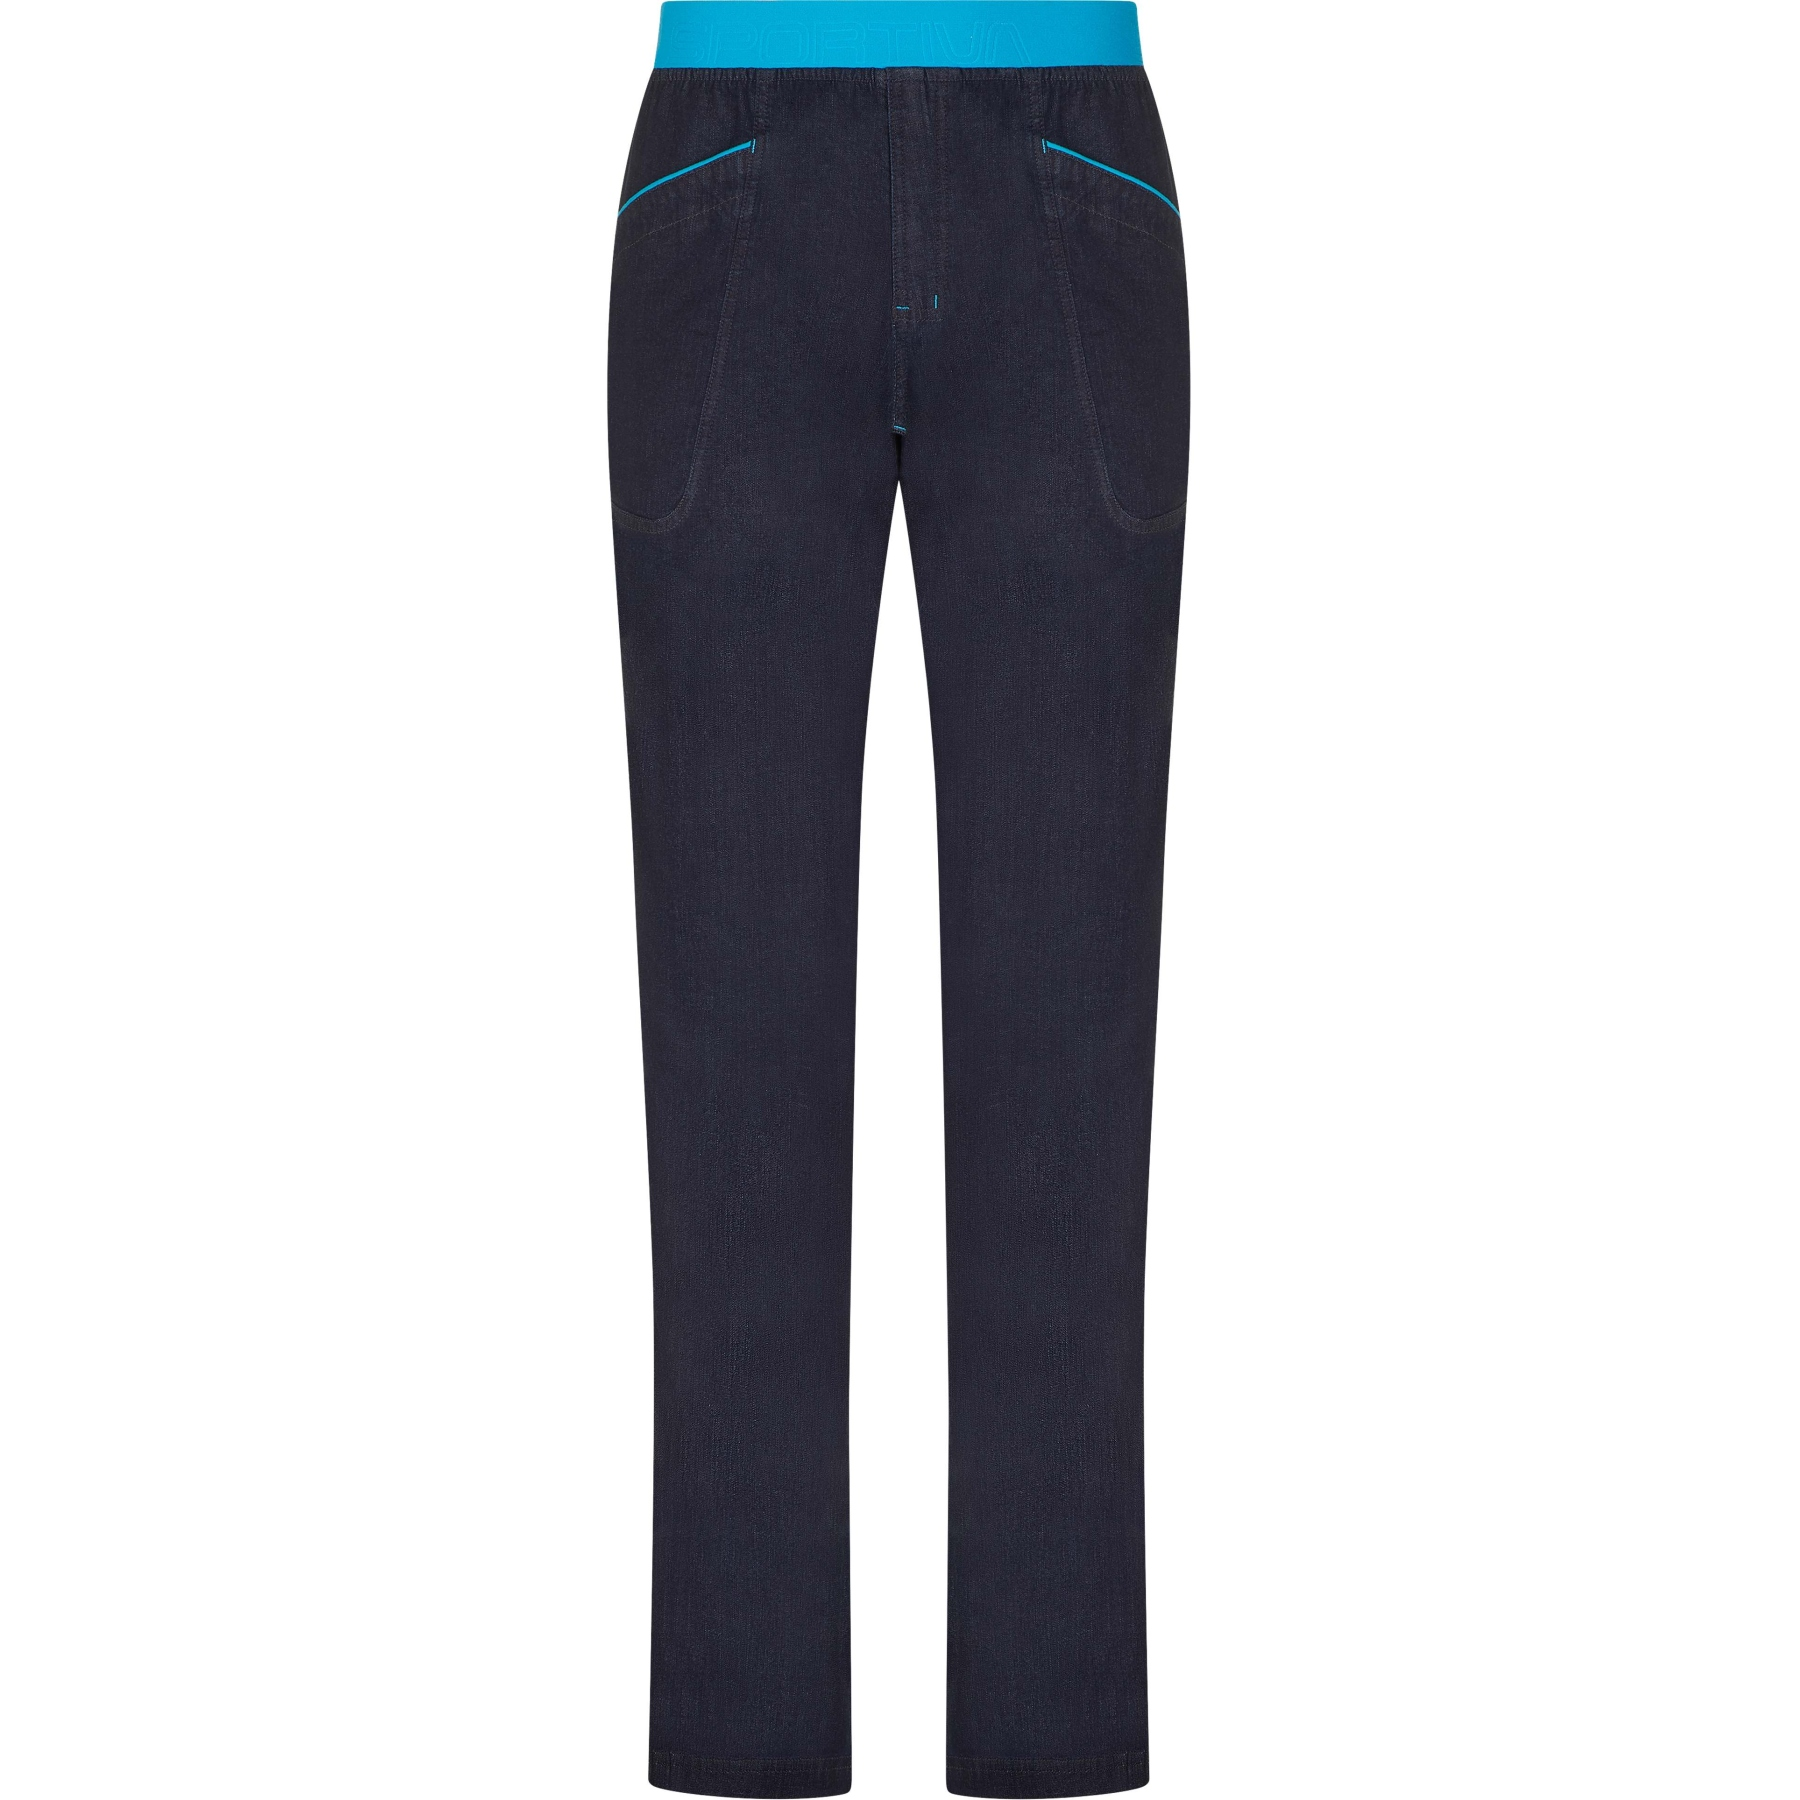 La Sportiva Cave Jeans Hose - Jeans